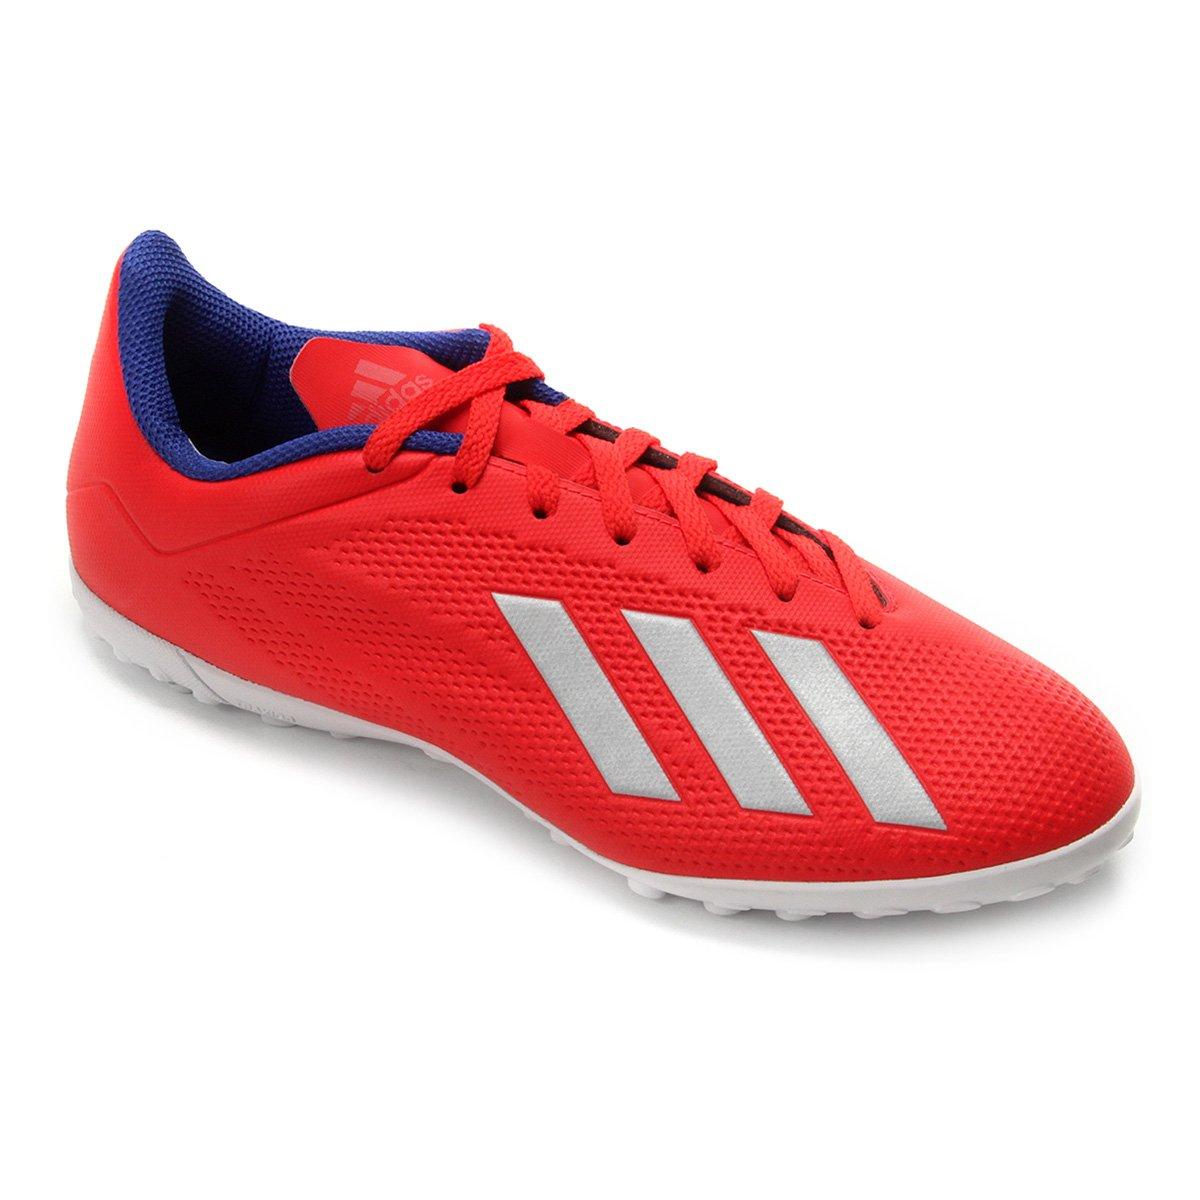 ff268b38e5 Chuteira Society Adidas X 18.4 TF